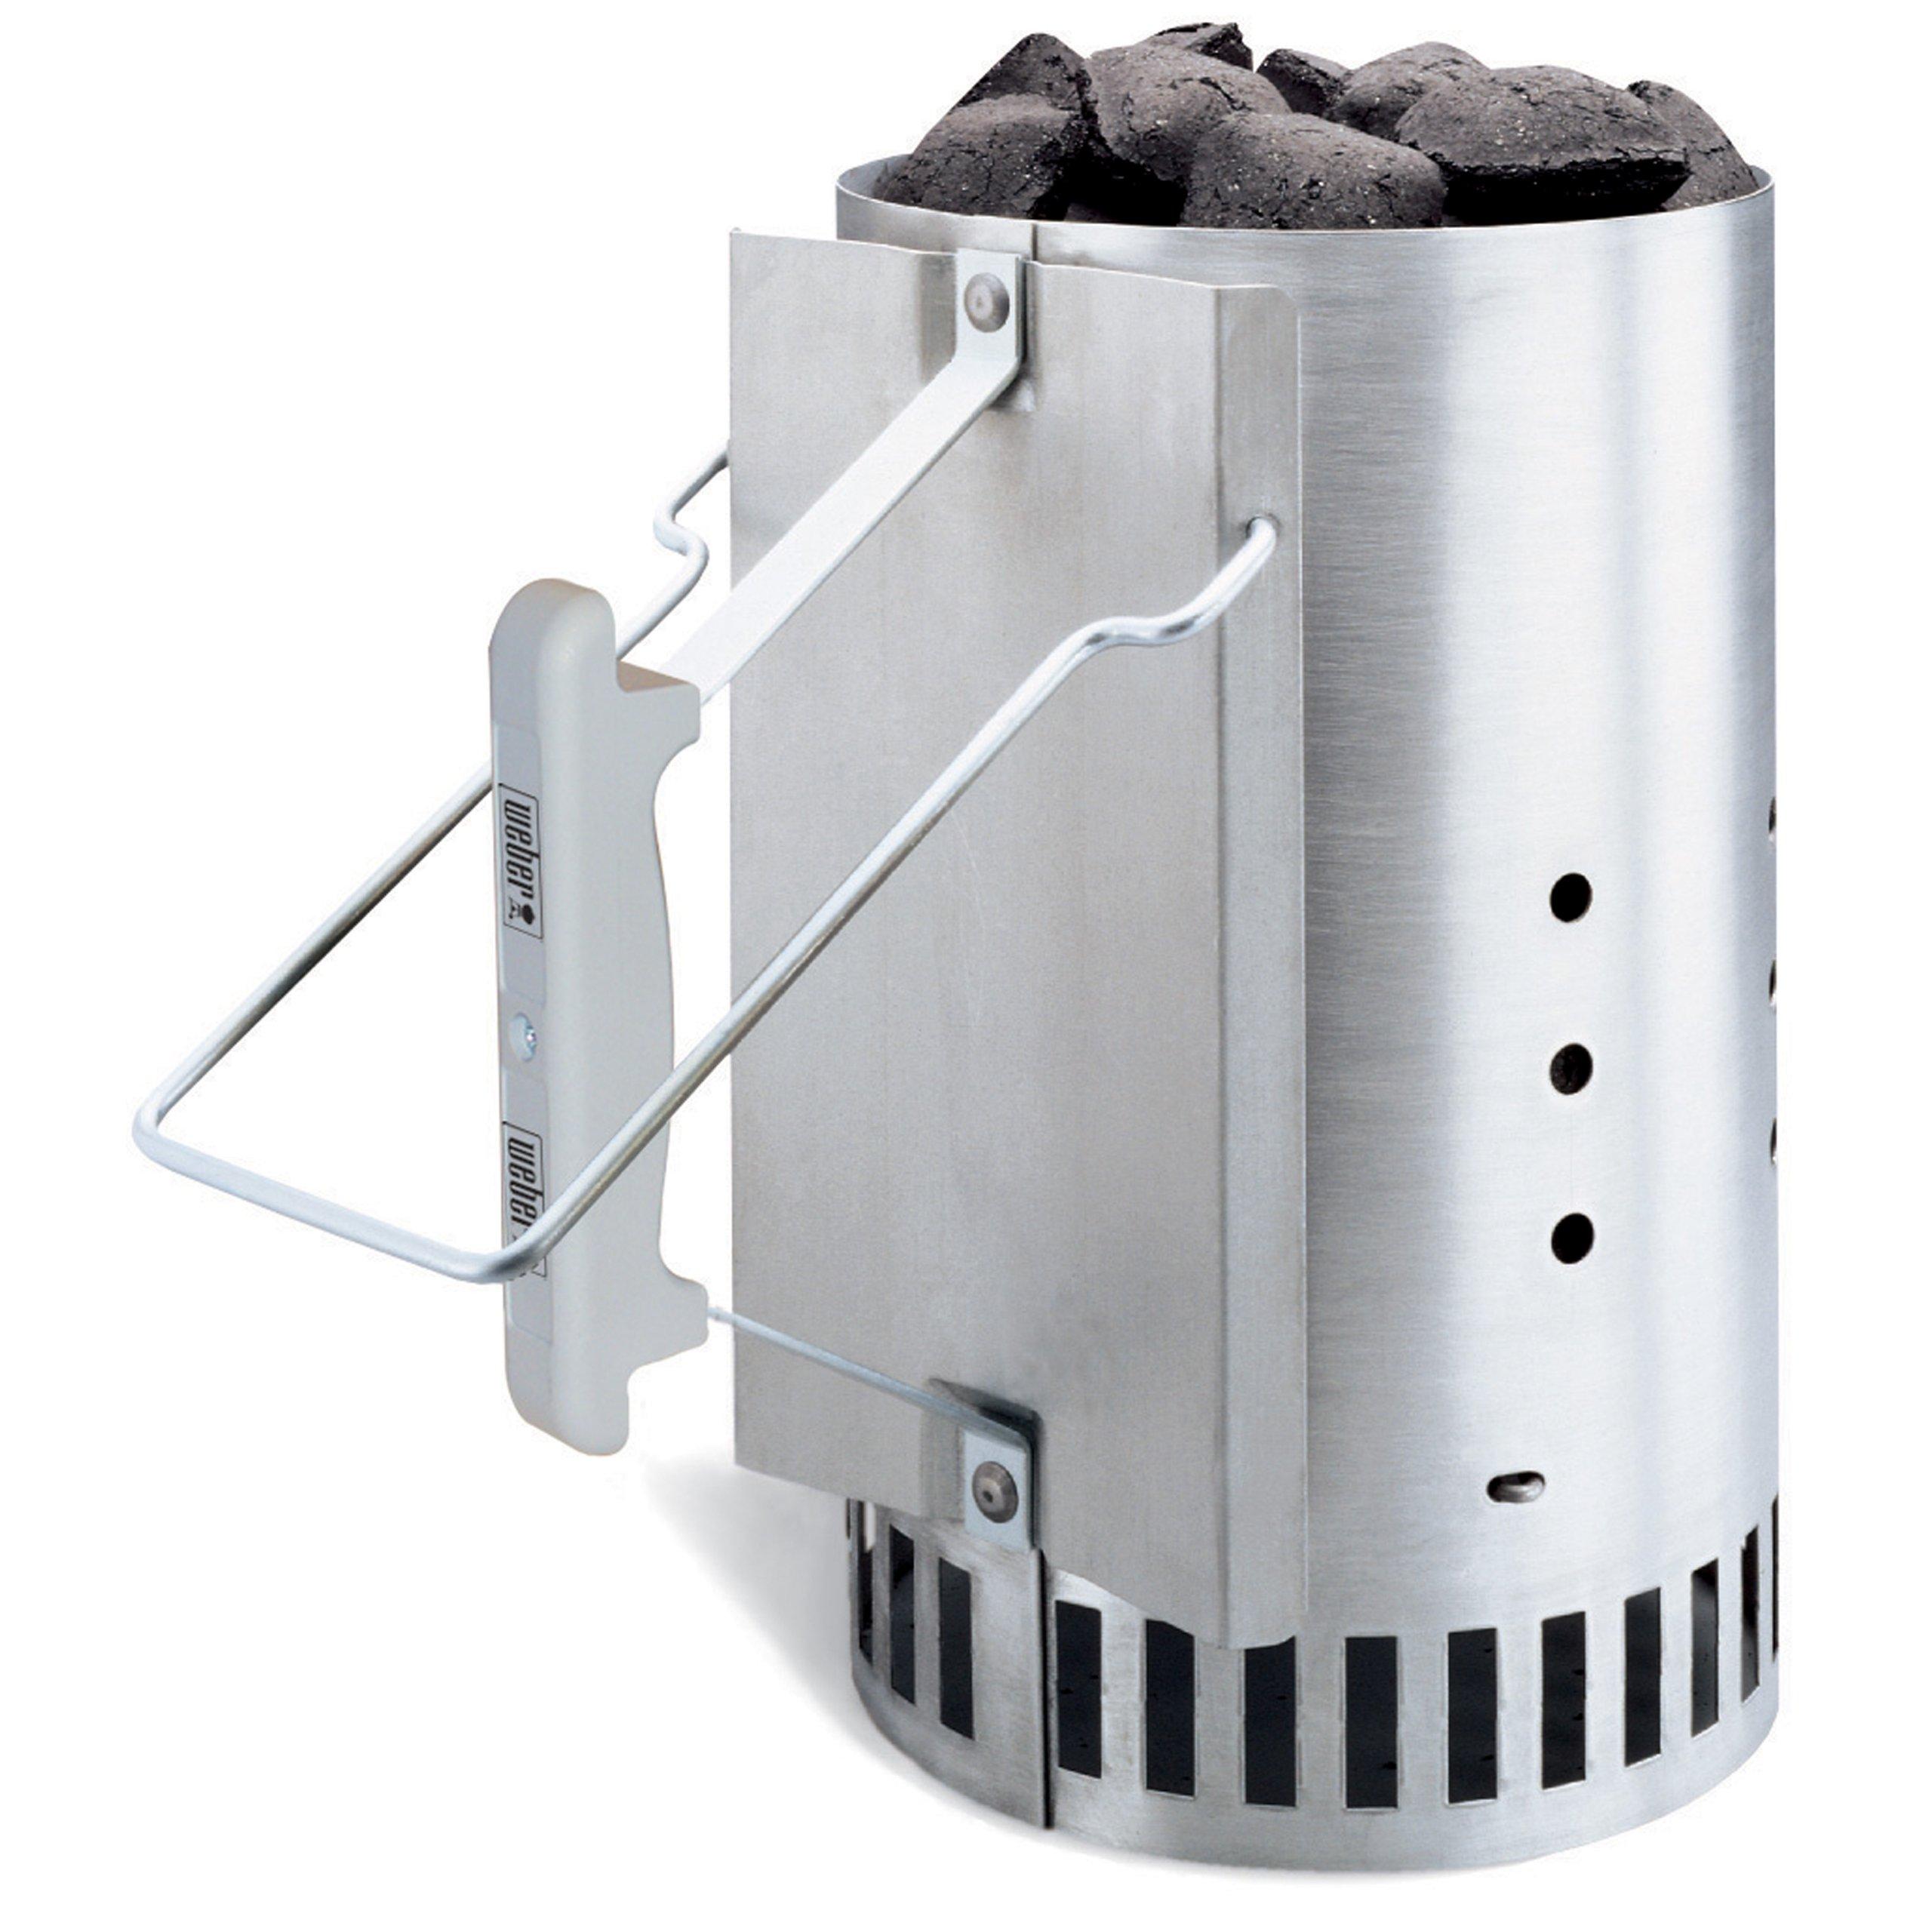 Weber 7416 Rapid-fire Chimney Starter